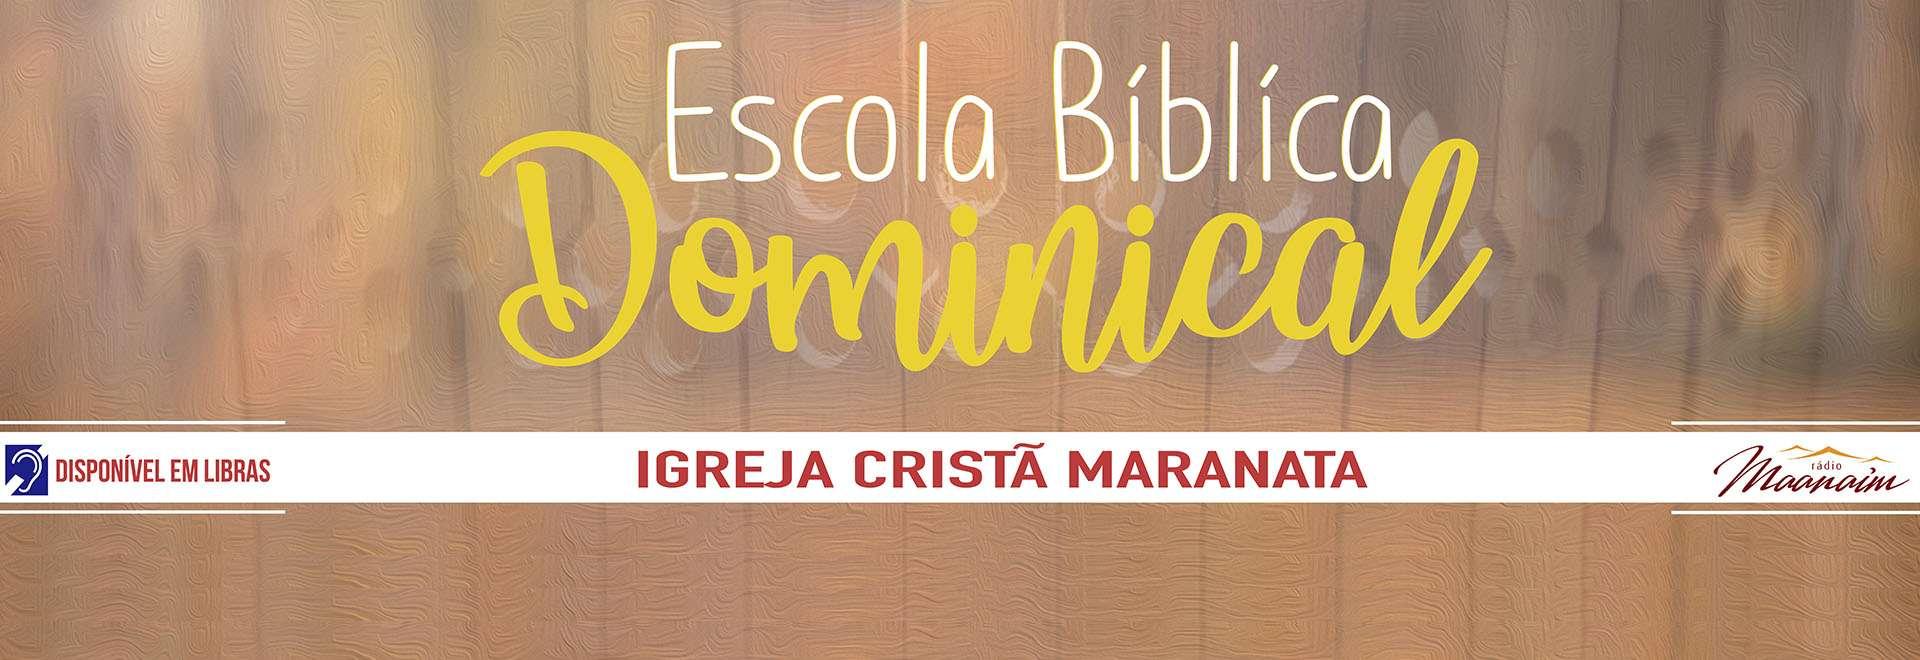 Participações da EBD da Igreja Cristã Maranata - 14/03/2021